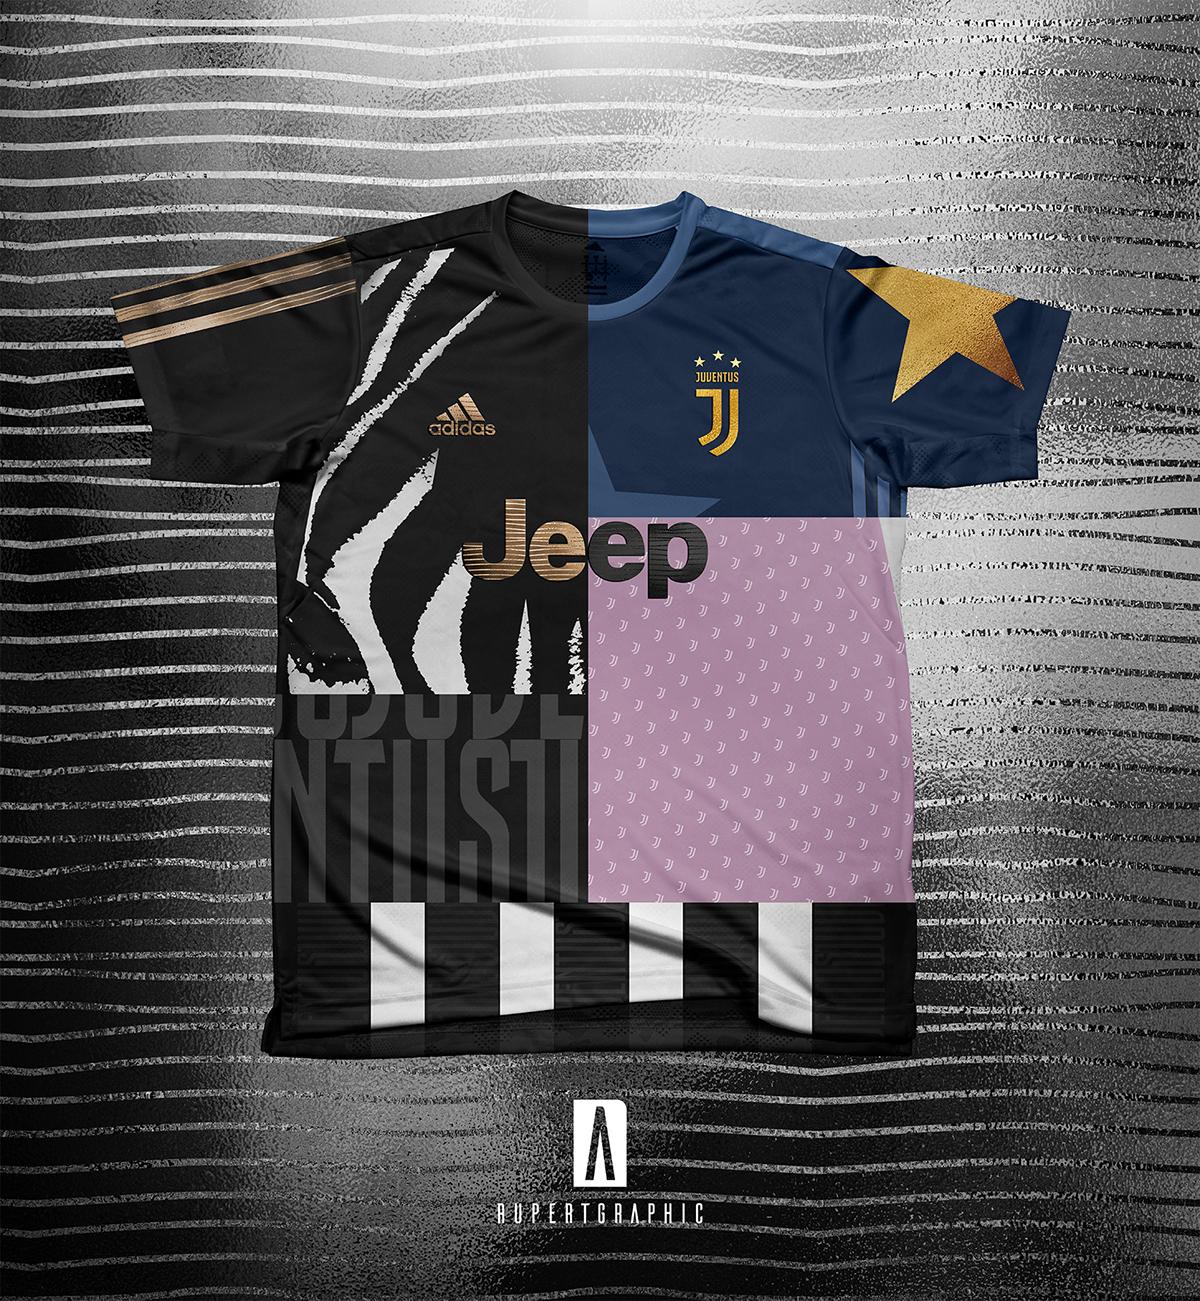 821cdc5b6a6 Juventus Concept 2018 19 - Adidas on Pantone Canvas Gallery